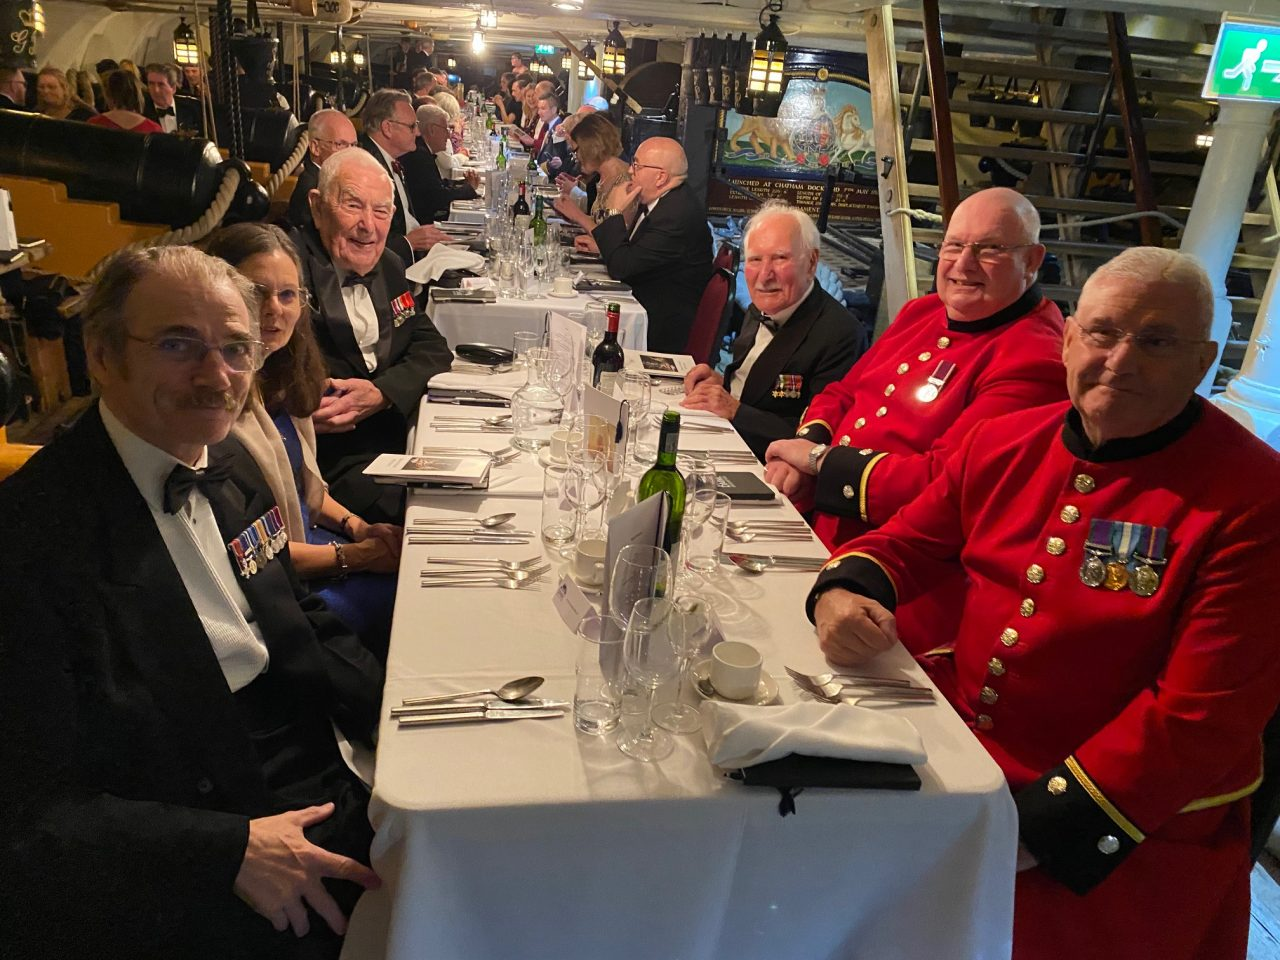 WWII Royal Navy Veterans enjoy dinner on HMS Victory